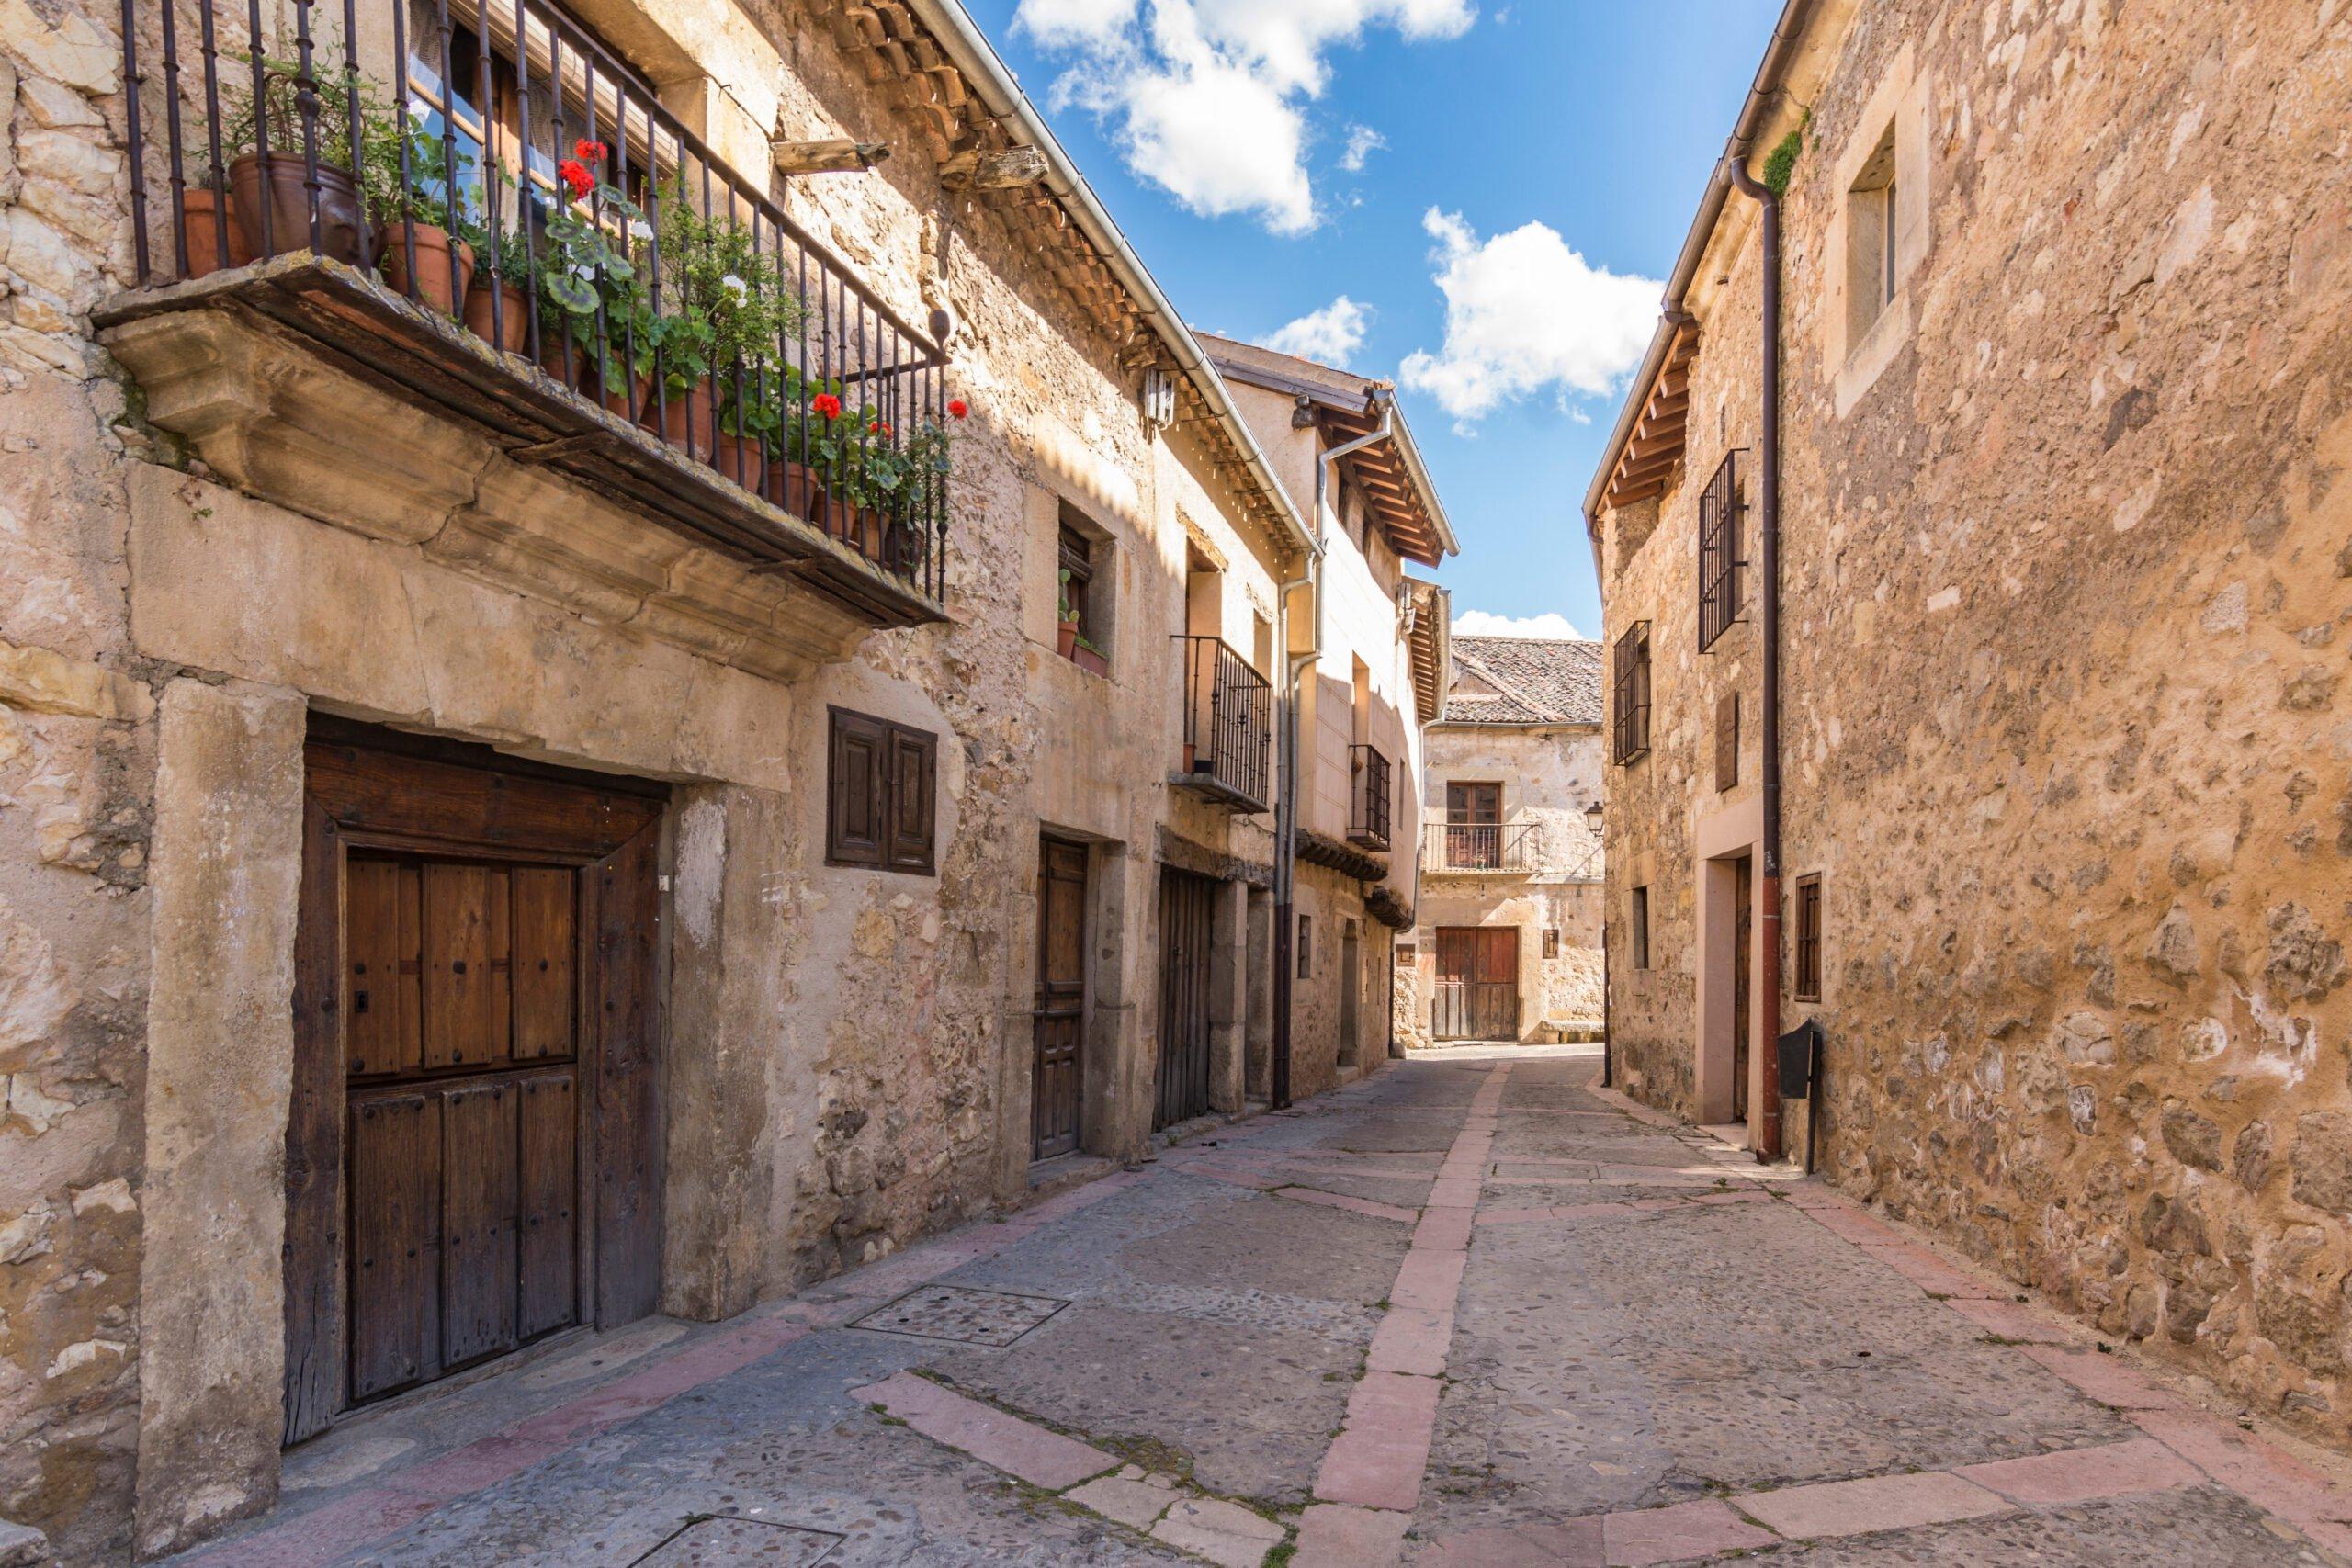 Explore Monumental Town Of Segovia In Our Sierra De Guadarrama Hiking & Segovia Tour